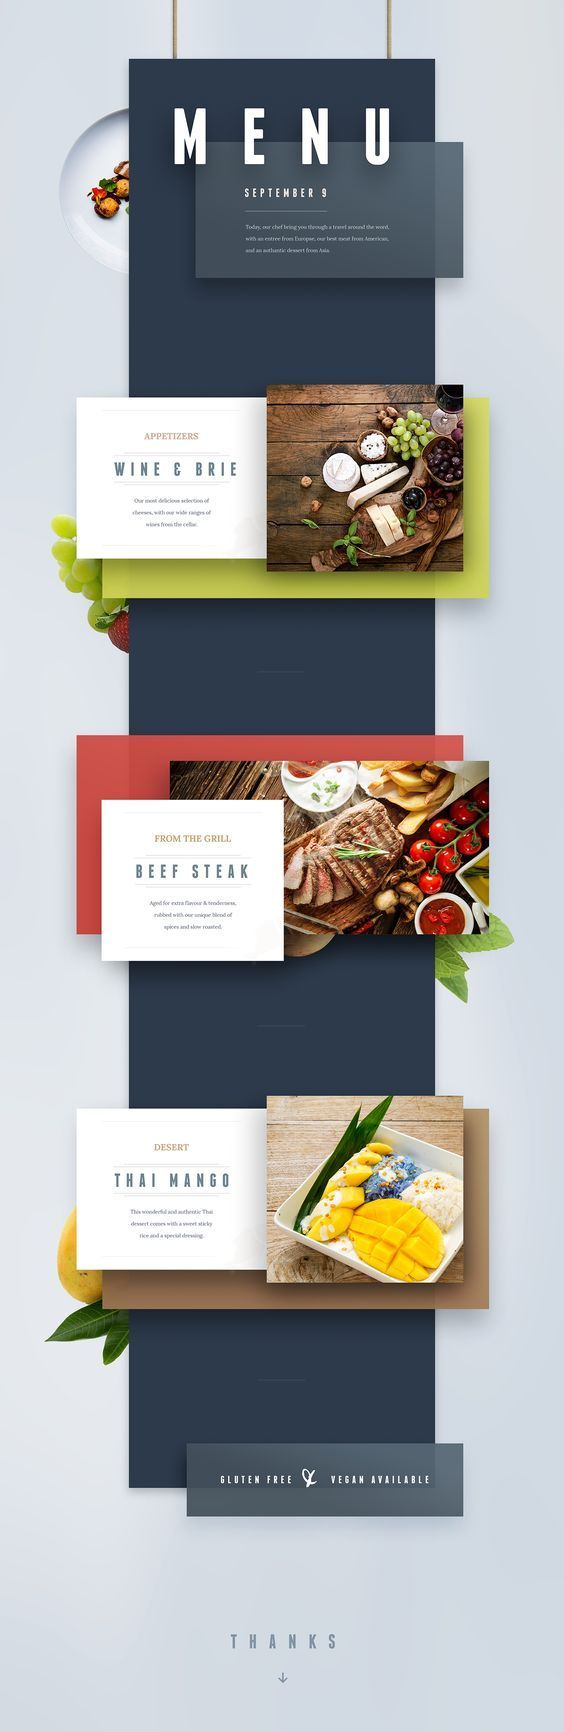 restaurant menu online inspiration #web #design. If you like UX, design, or design thinking, check out theuxblog.com